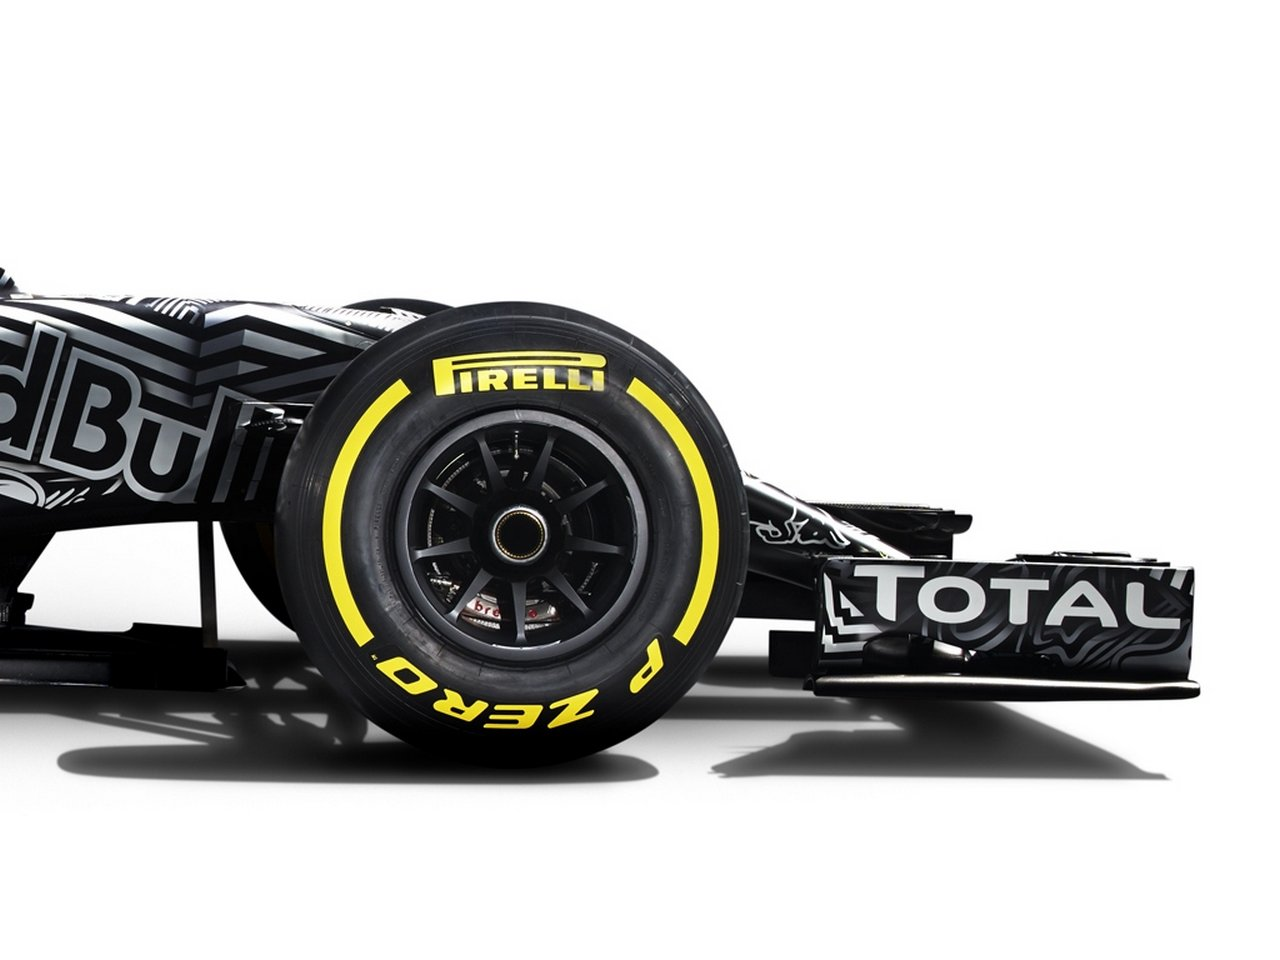 infiniti-red-bull-racing-rb-11-2015-formula-1-Daniil-Kvyat-Daniel-Ricciardo_0-100_6